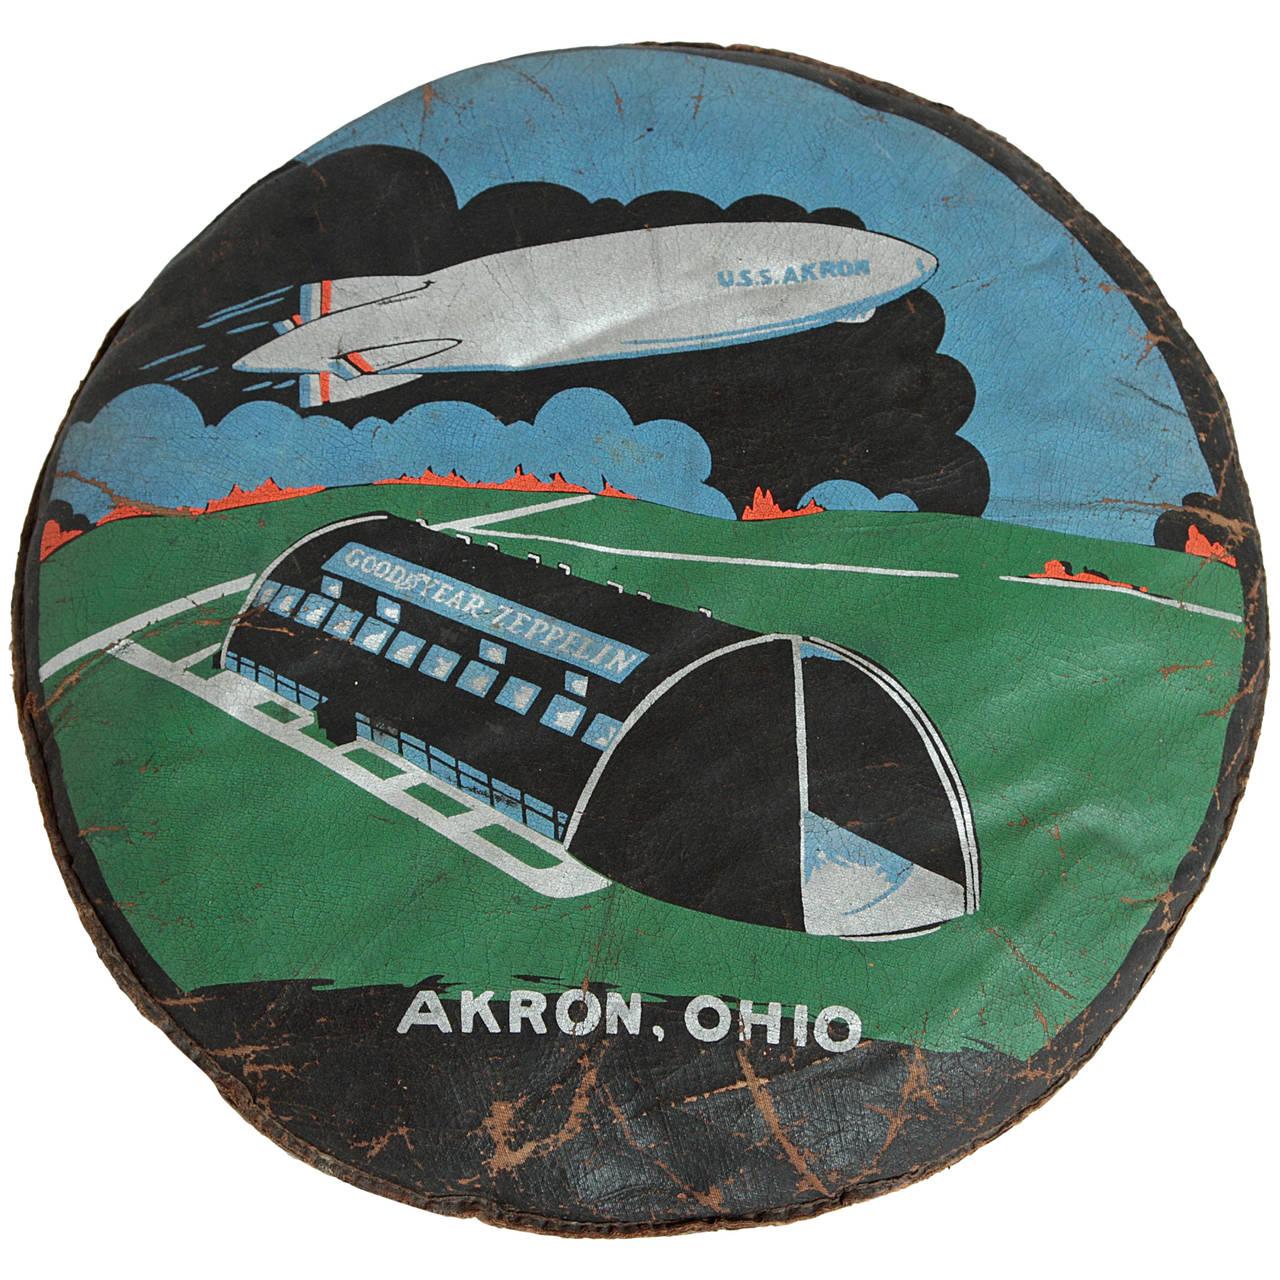 Rare U.S.S. Akron Goodyear Zeppelin Cushion in Art Deco Style 1